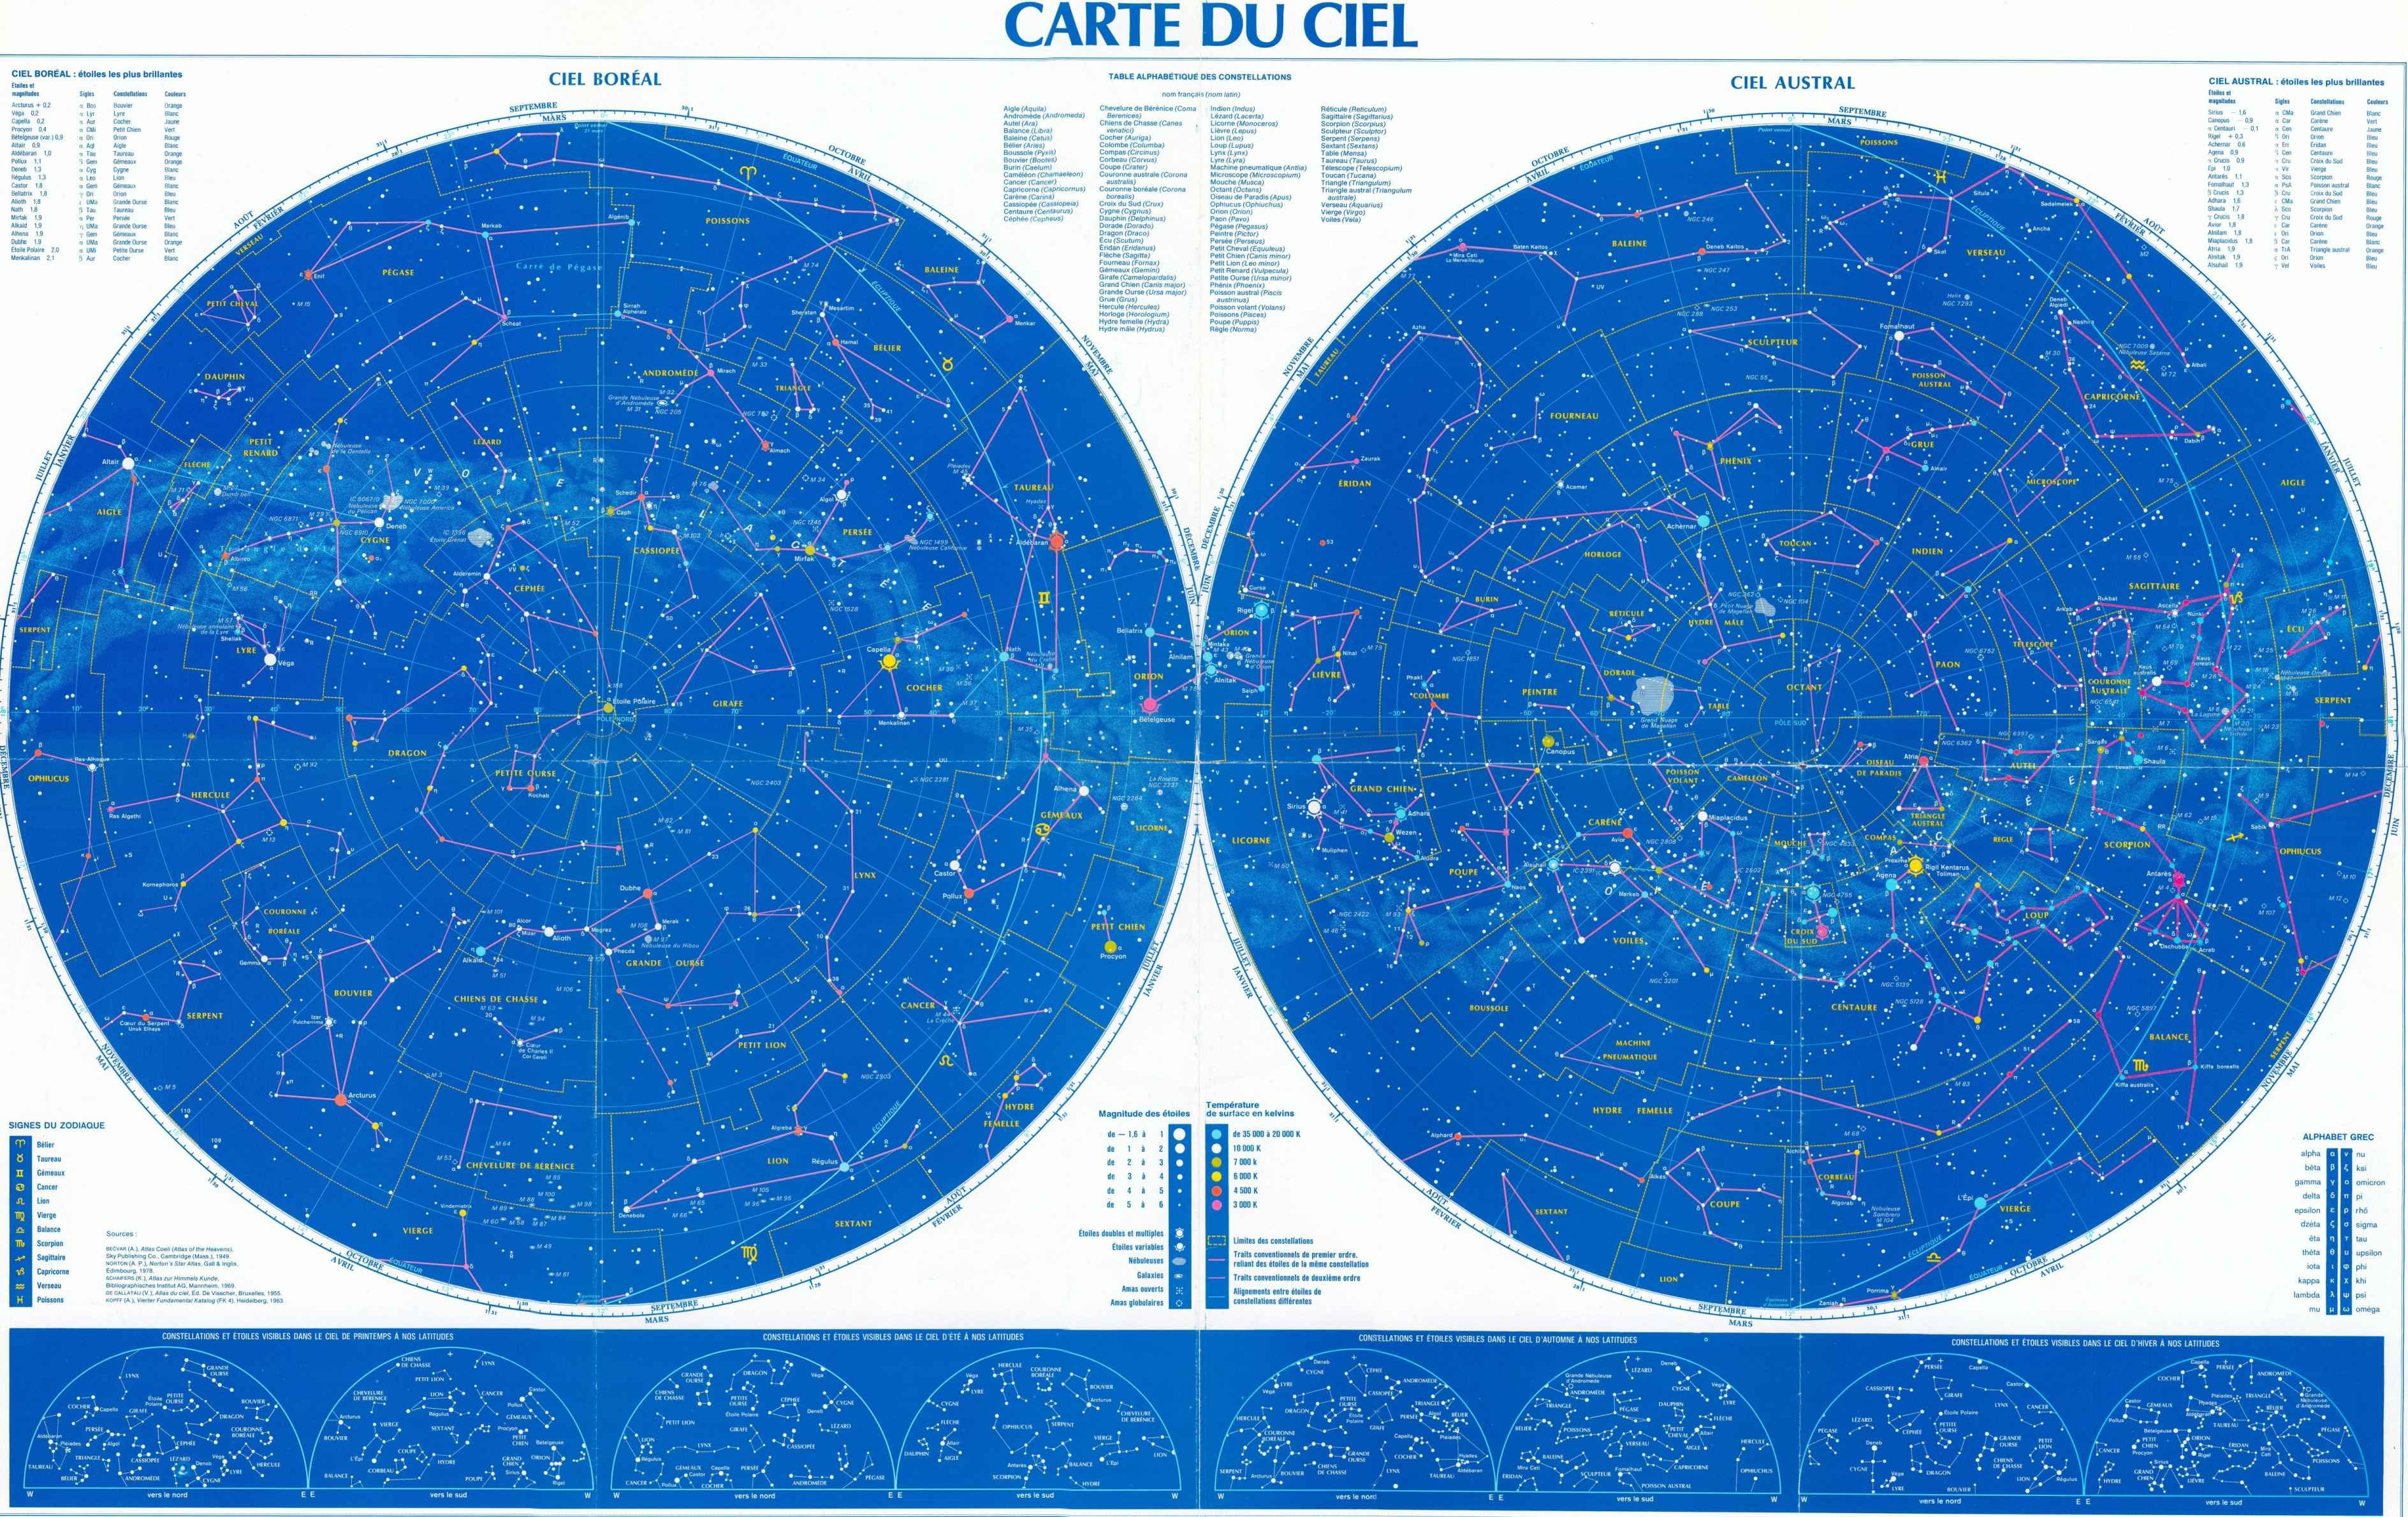 Carte Du Ciel Carte Du Ciel Constellations